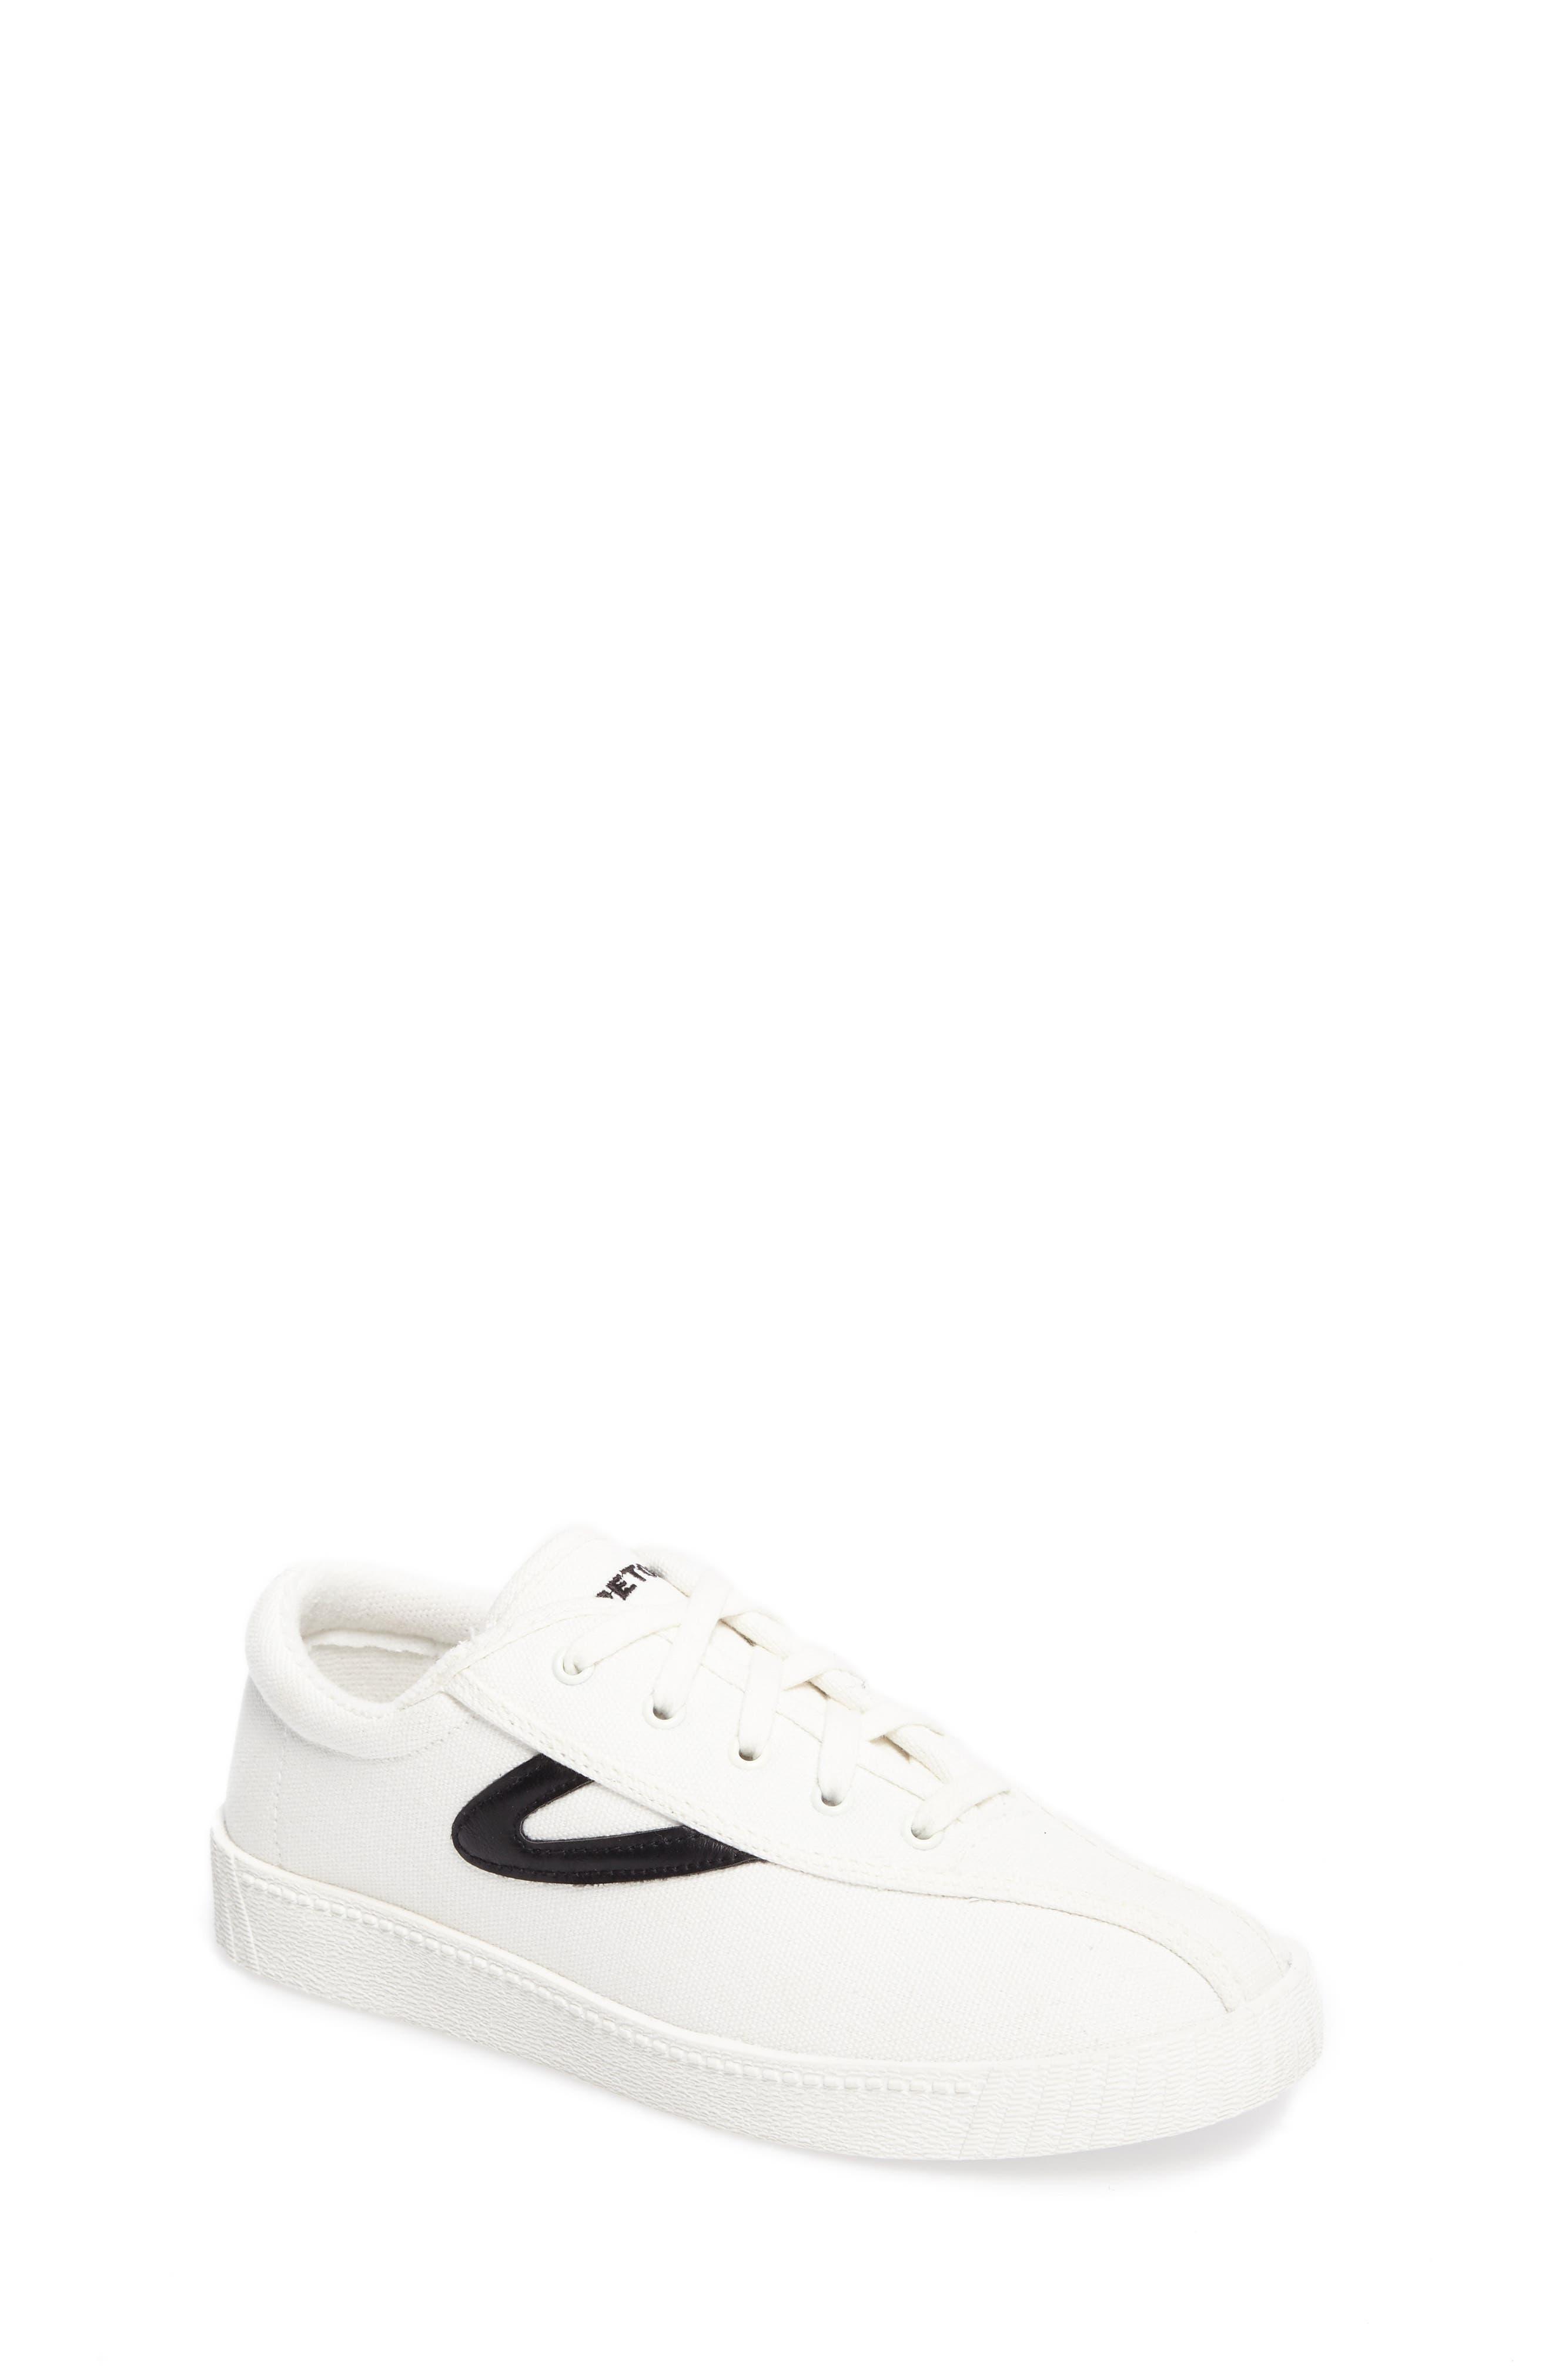 Nylite Plus Sneaker,                         Main,                         color, White/ Black